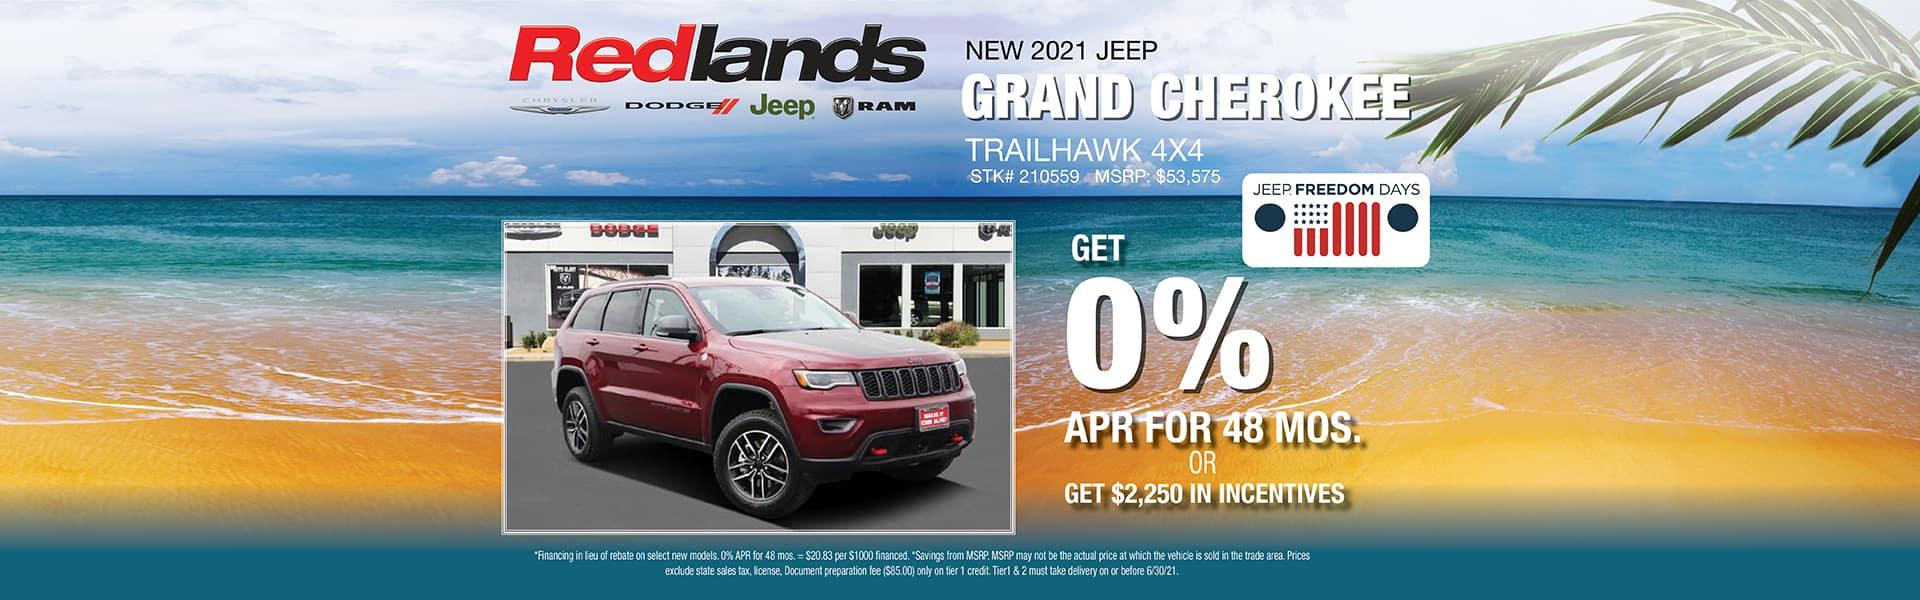 2021 Jeep Grand Cherokee Lease Offer | Redlands CDJR